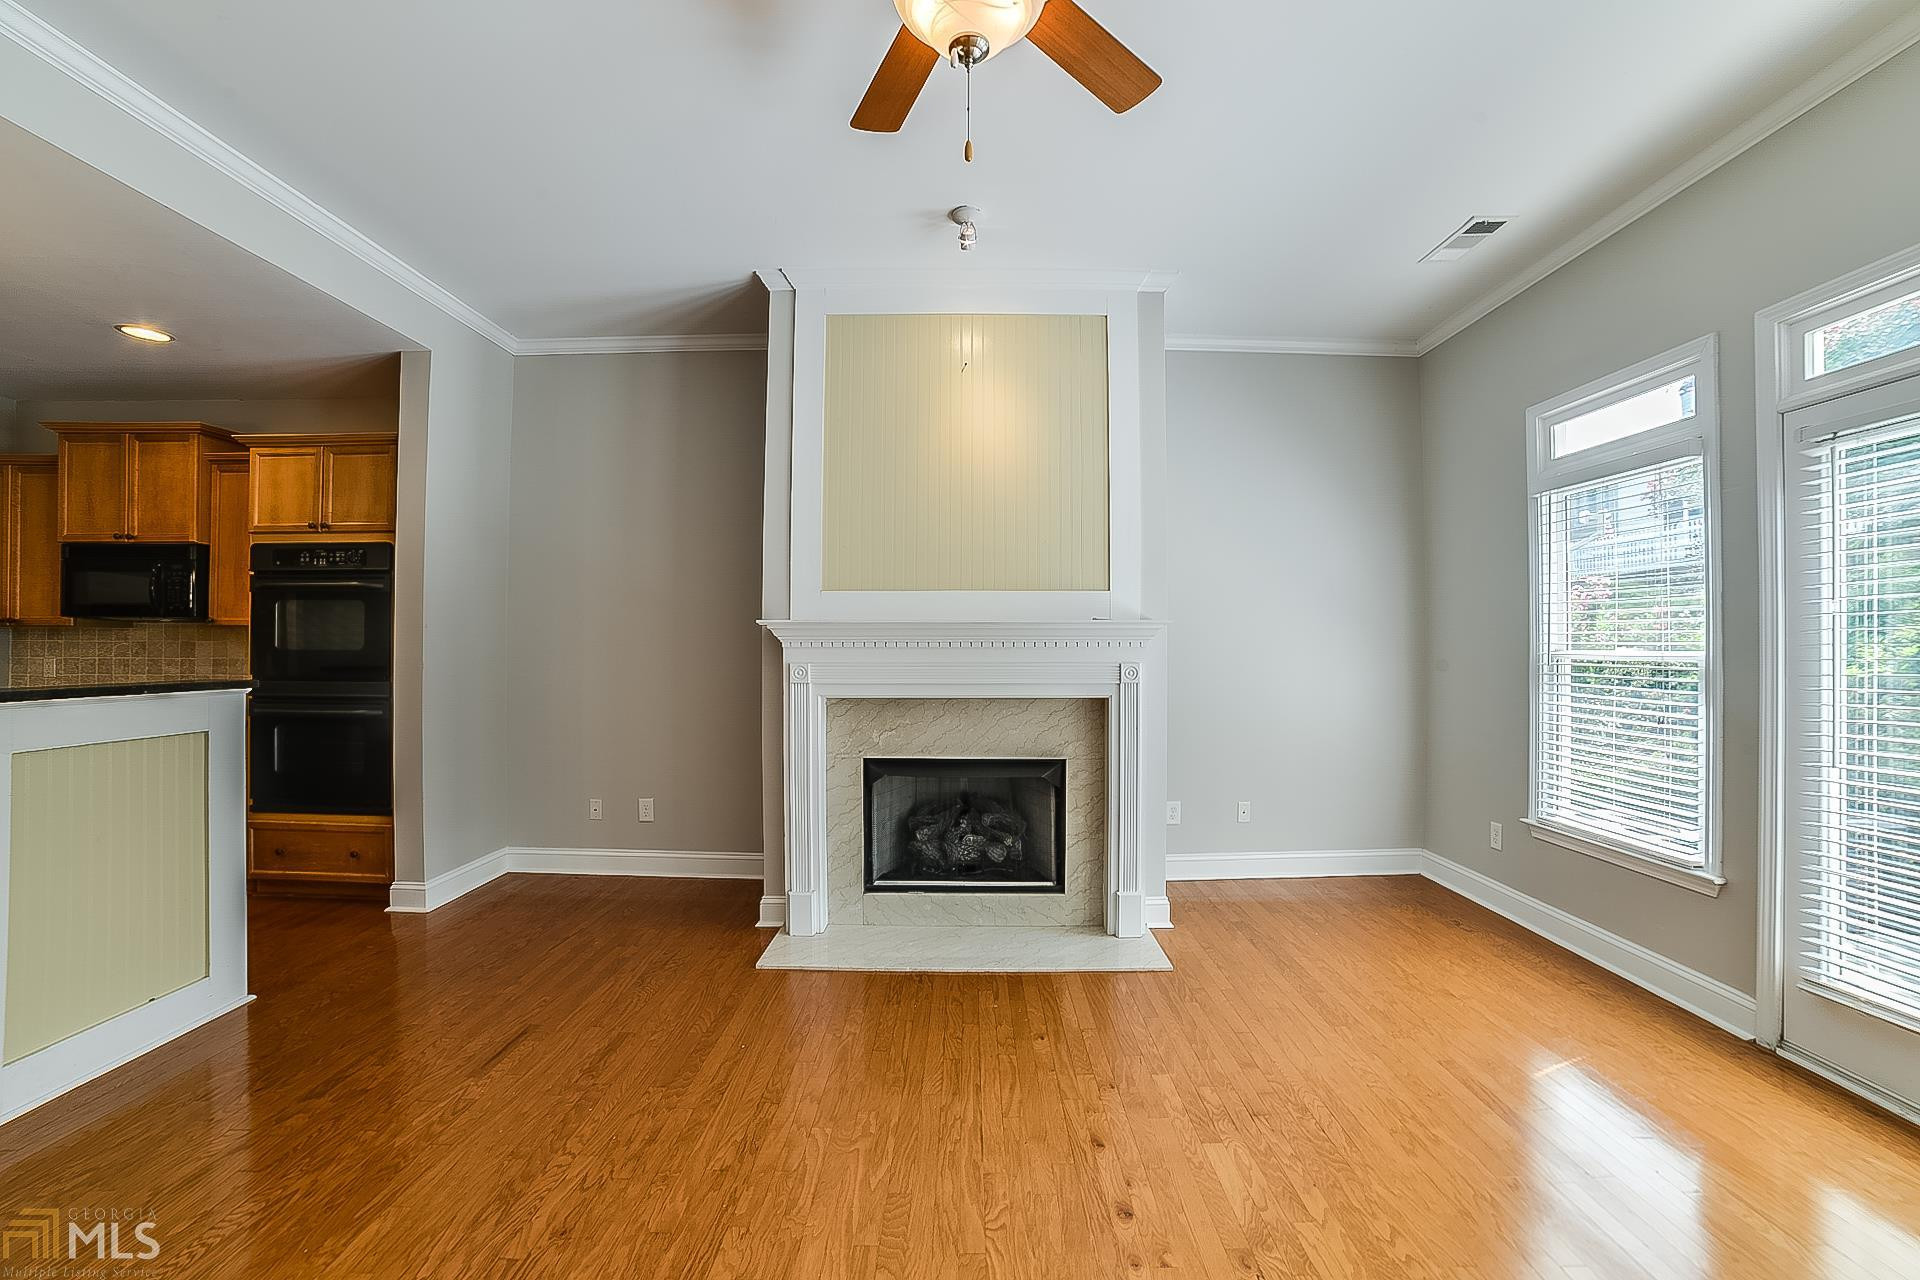 ct hardwood flooring llc of 4230 glen vista ct duluth ga 30097 georgia mls with 4230 glen vista ct duluth ga 30097